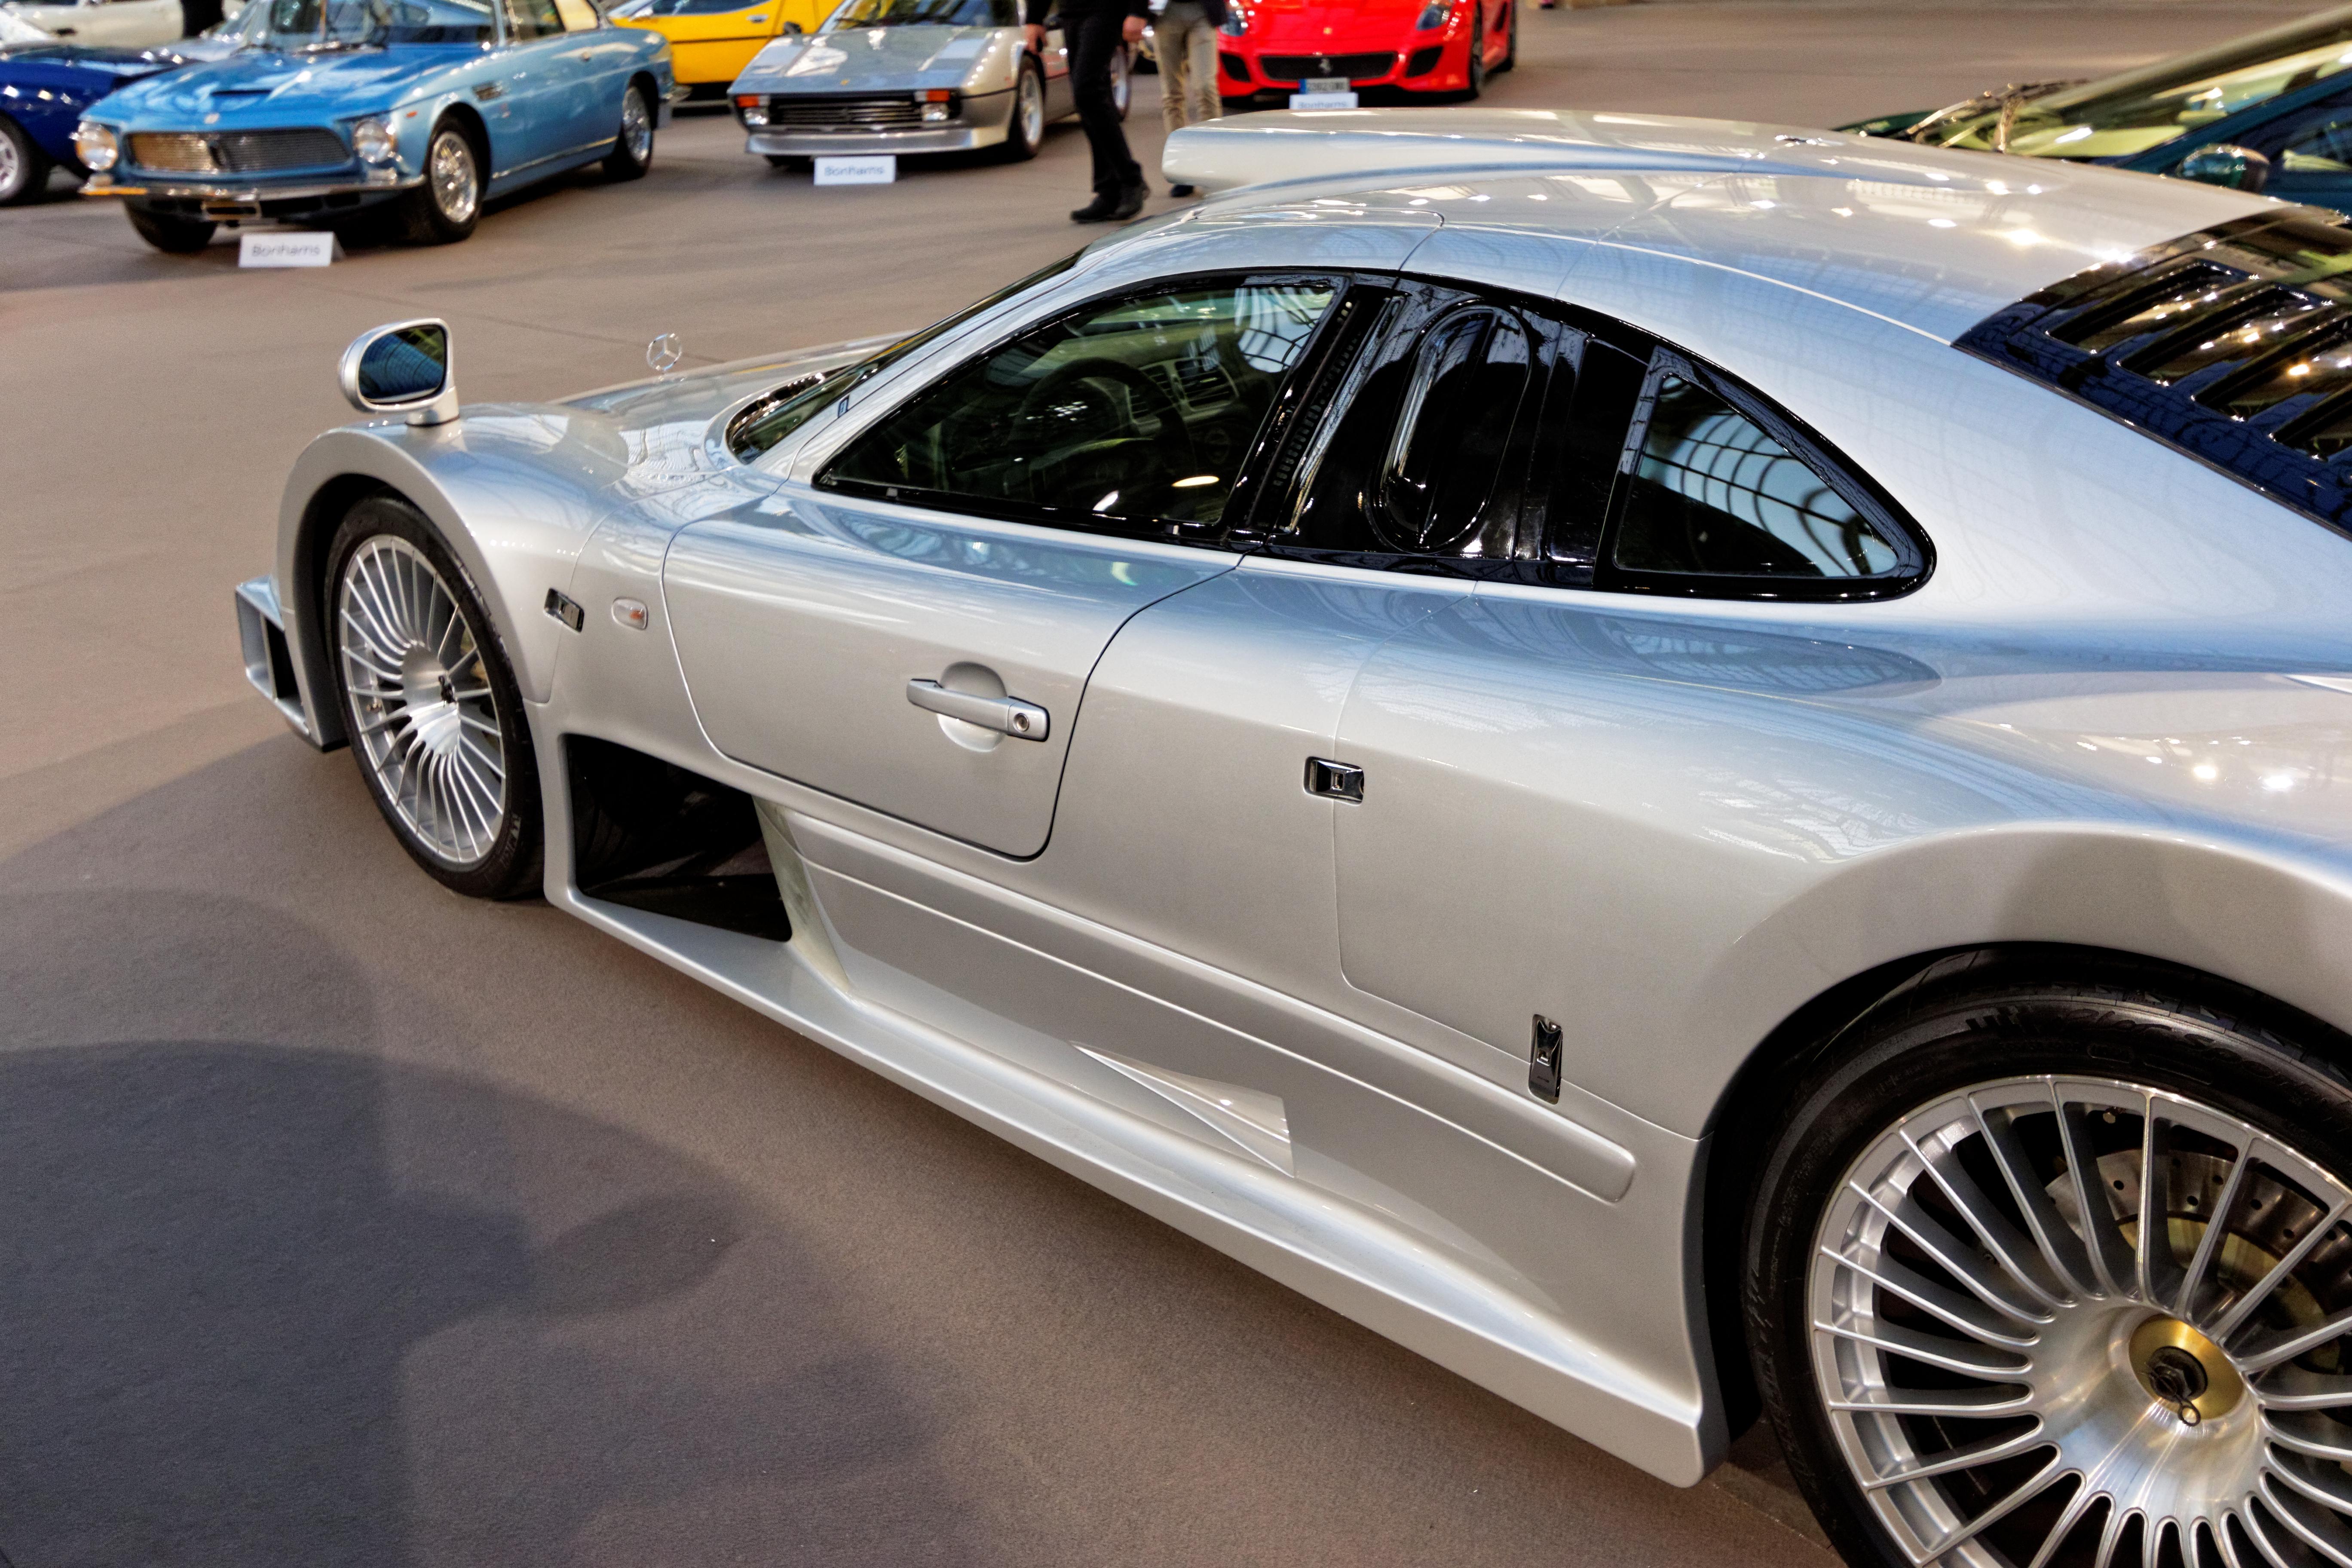 File Paris Bonhams 2016 Mercedes Benz Clk Gtr Coupé 2000 005 Jpg